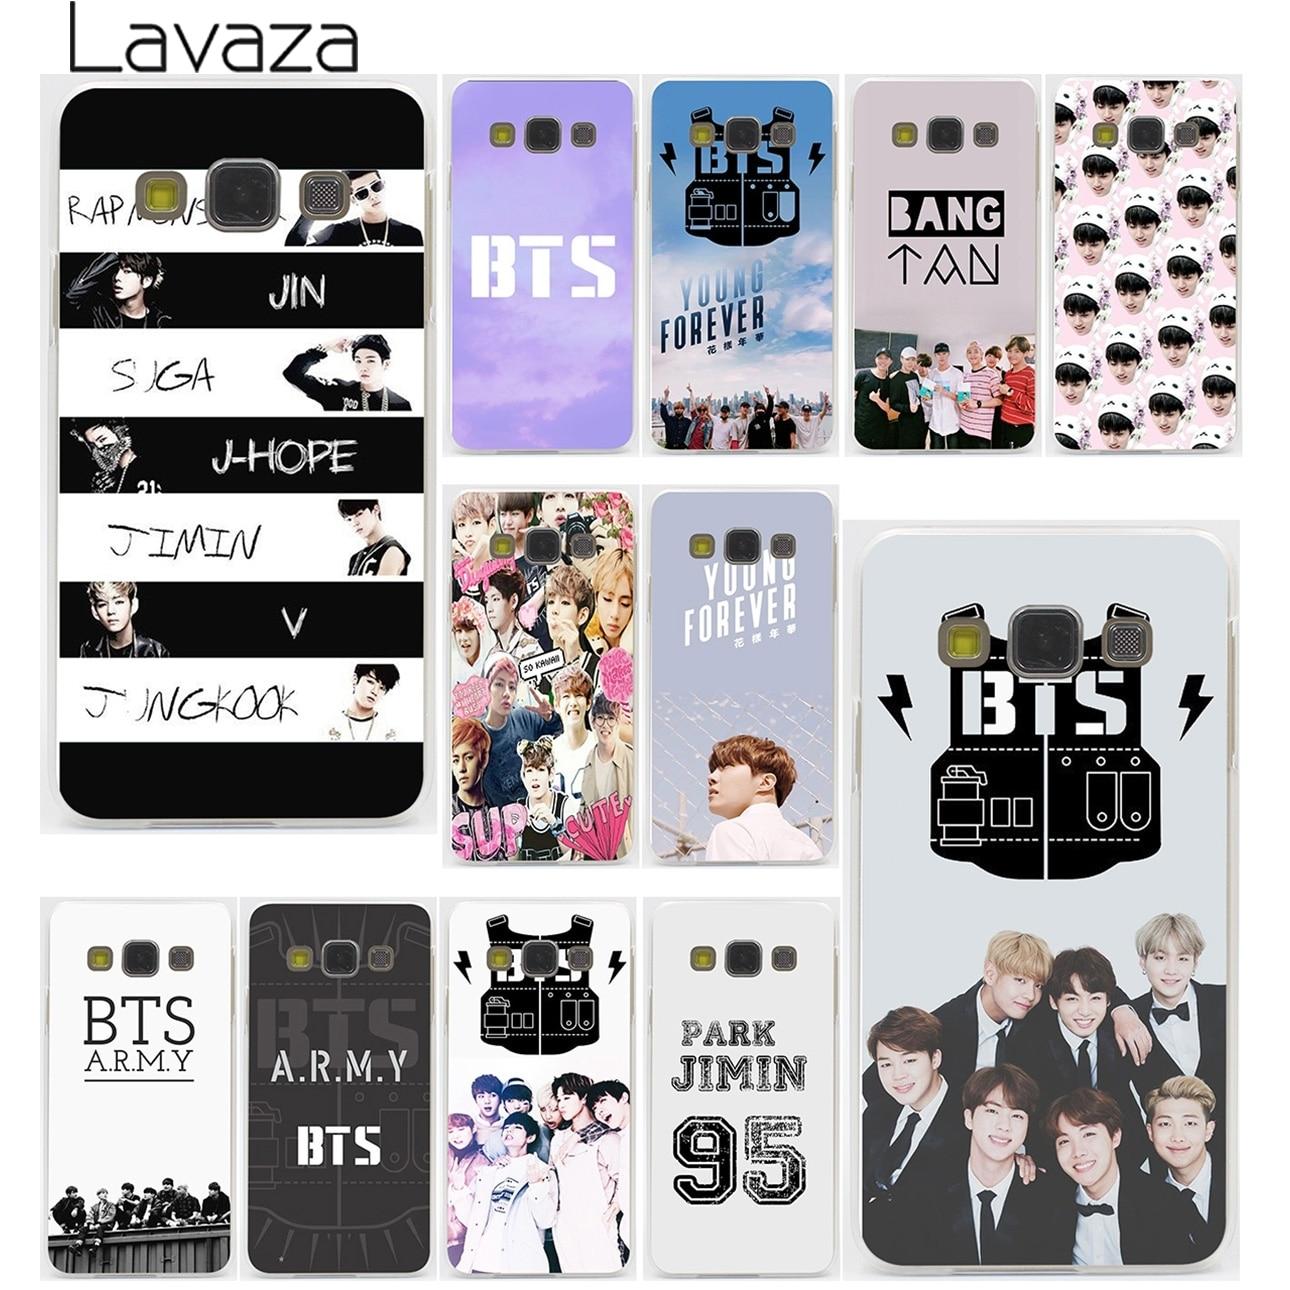 BTS  Bangtan Boys music logo  Hard Case Transparent for Galaxy A3 A5 7 8 J5 7 & Note 2 3 4 5 & Grand Prime